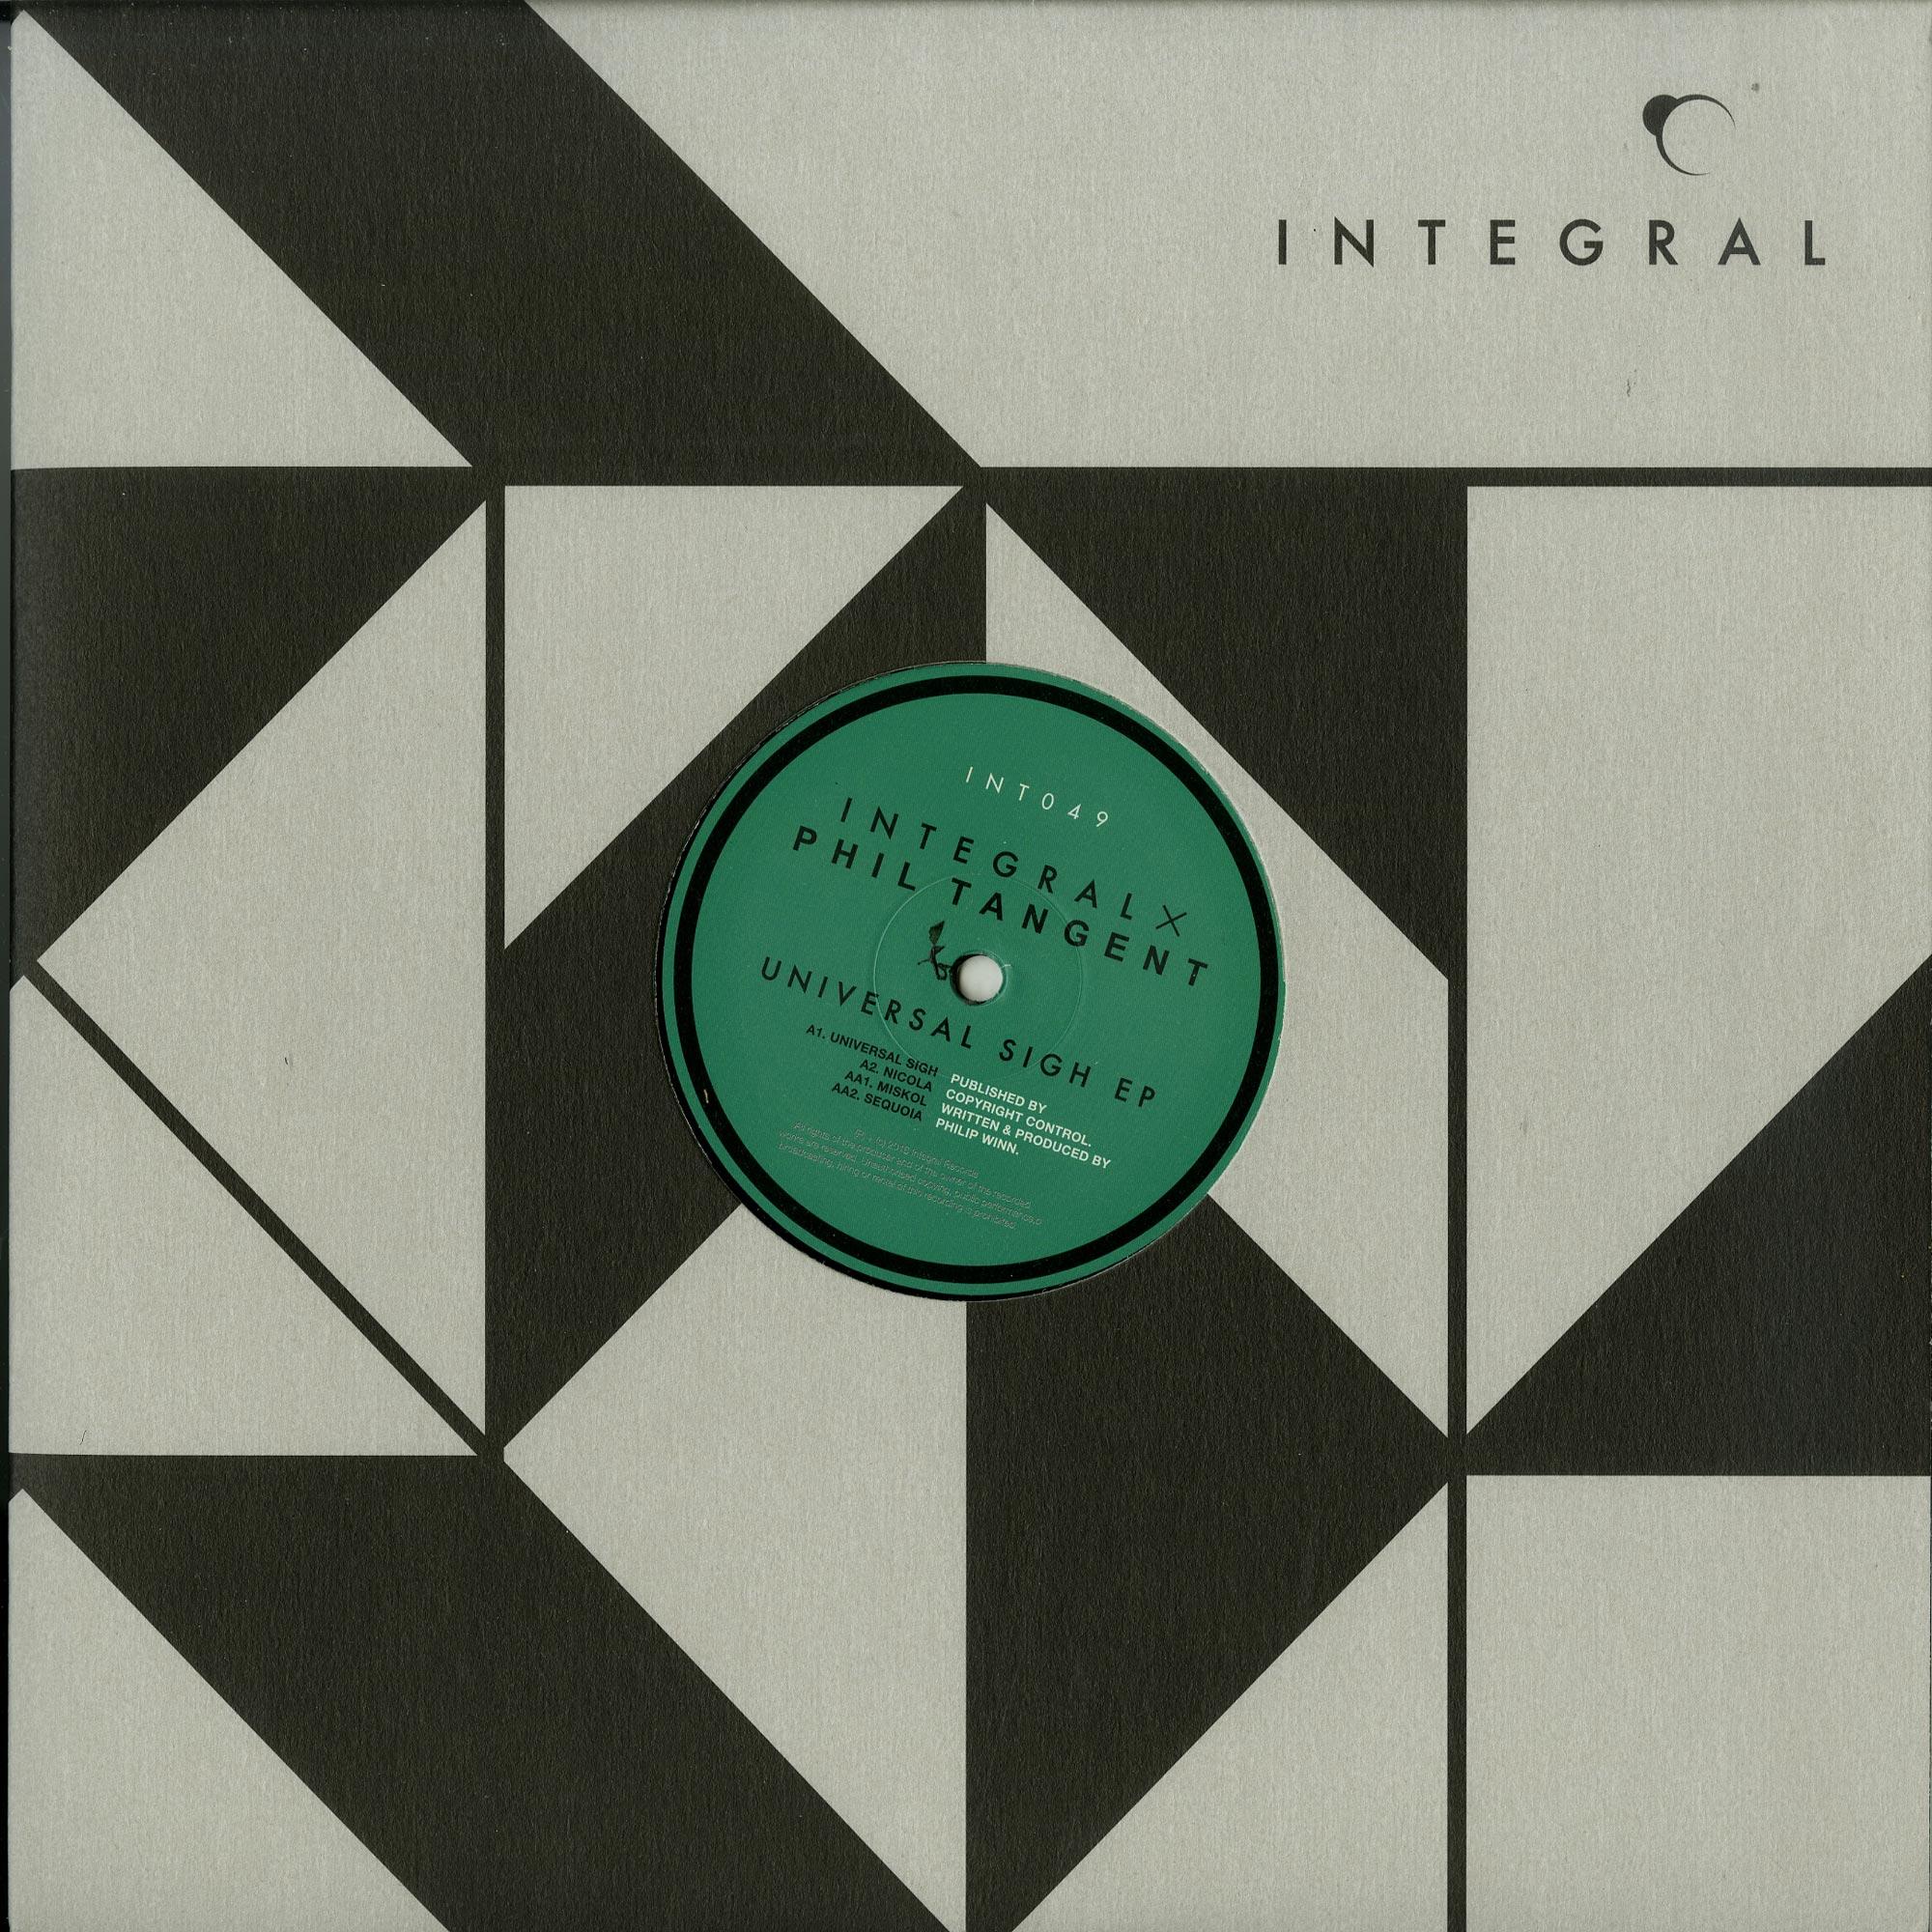 Phil Tangent - UNIVERSAL SIGHT EP